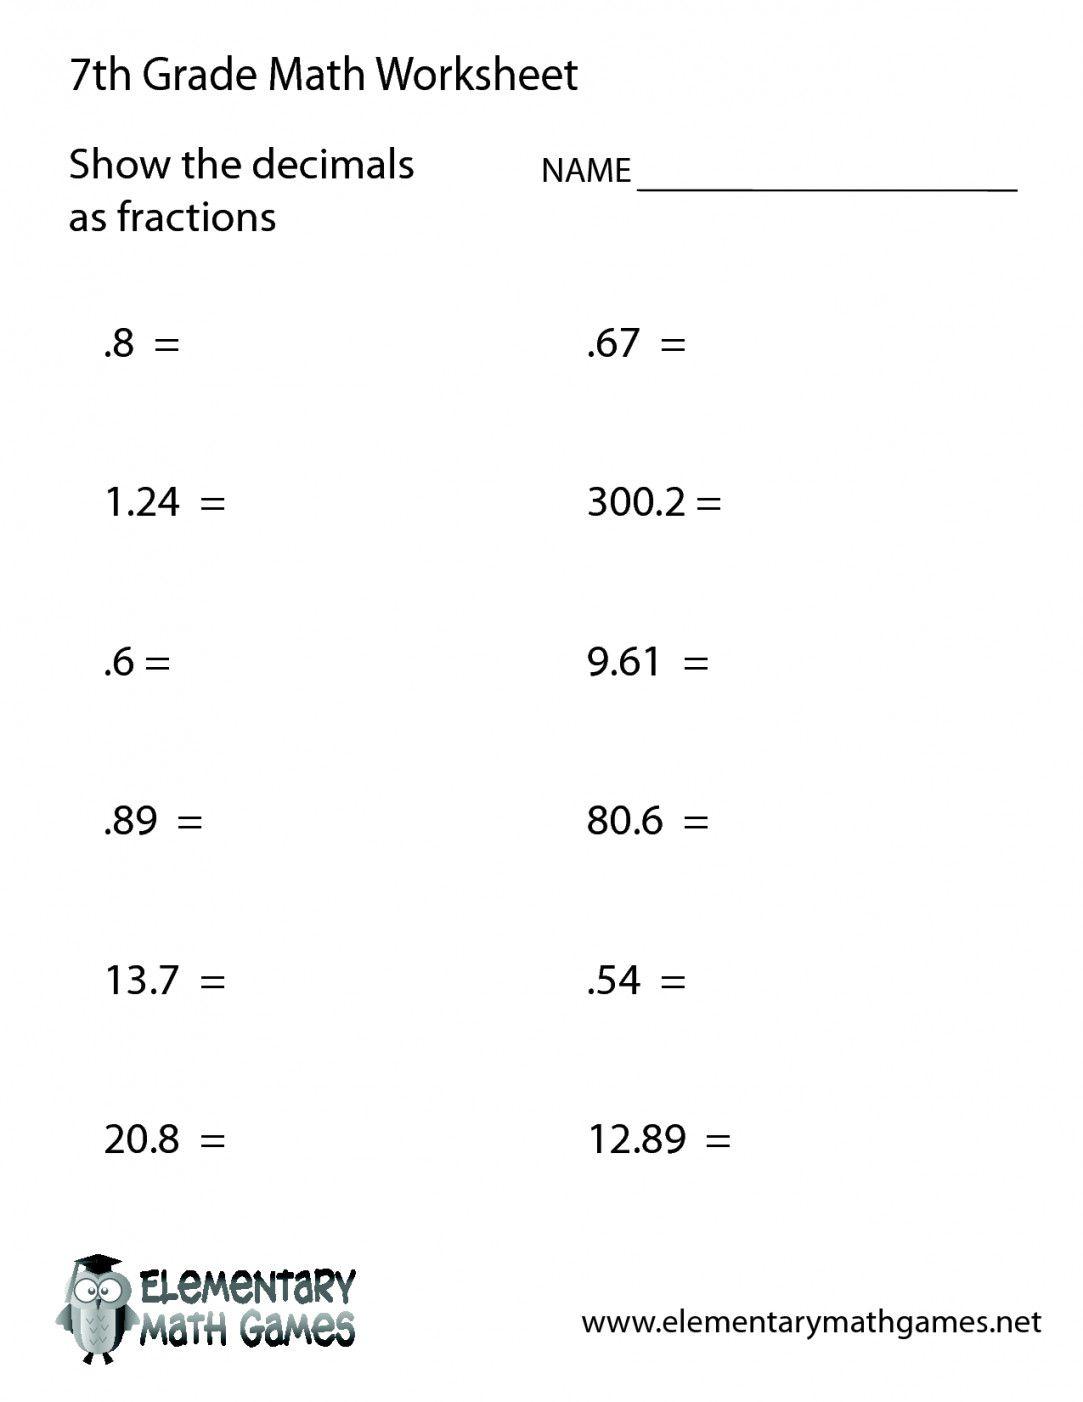 Free Printable 7Th Grade Math Worksheets   Lostranquillos - Free Printable 7Th Grade Math Worksheets